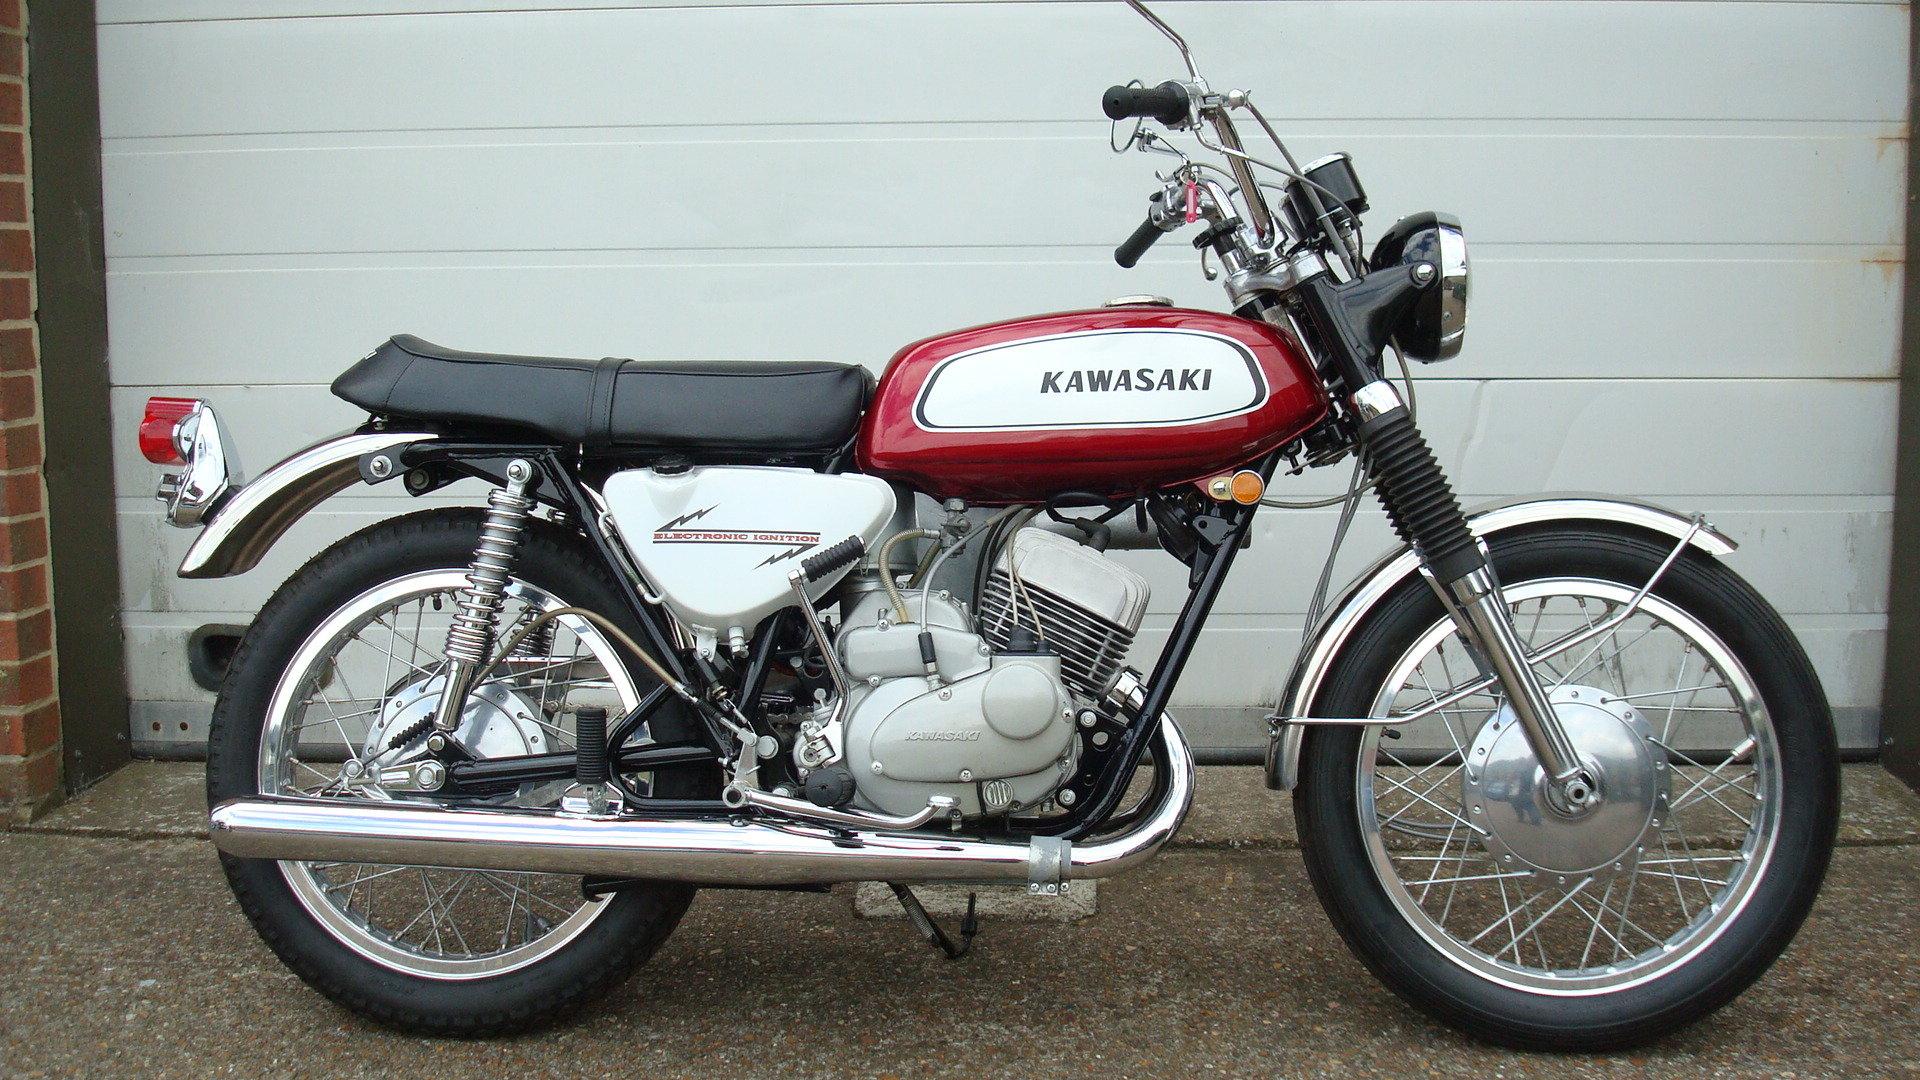 Kawasaki A1A Samurai 250 1970-J **SHOW STANDARD,RESTORED** For Sale (picture 1 of 6)